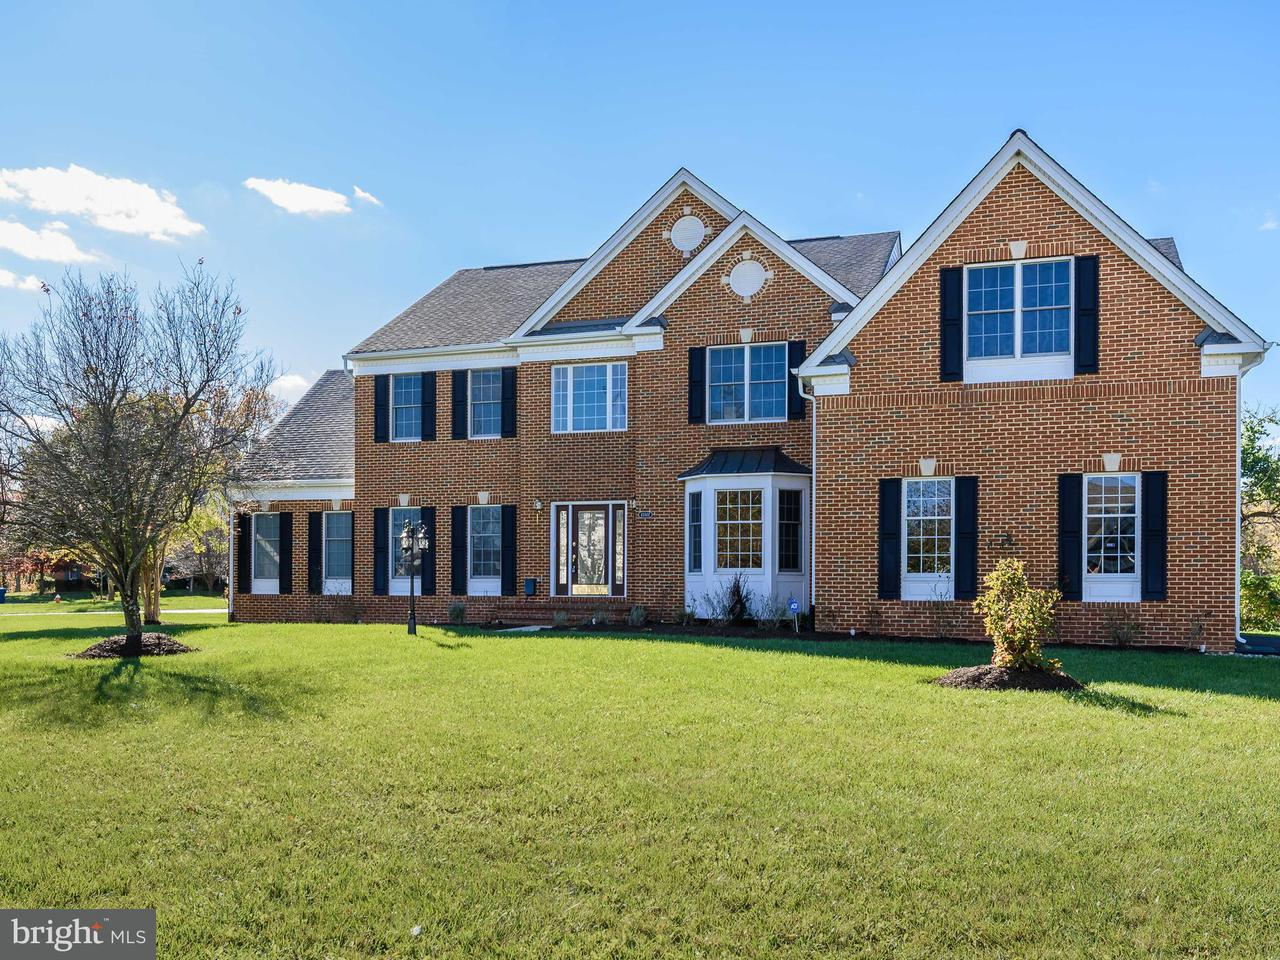 Single Family Home for Sale at 43507 OGDEN Place 43507 OGDEN Place Sterling, Virginia 20166 United States